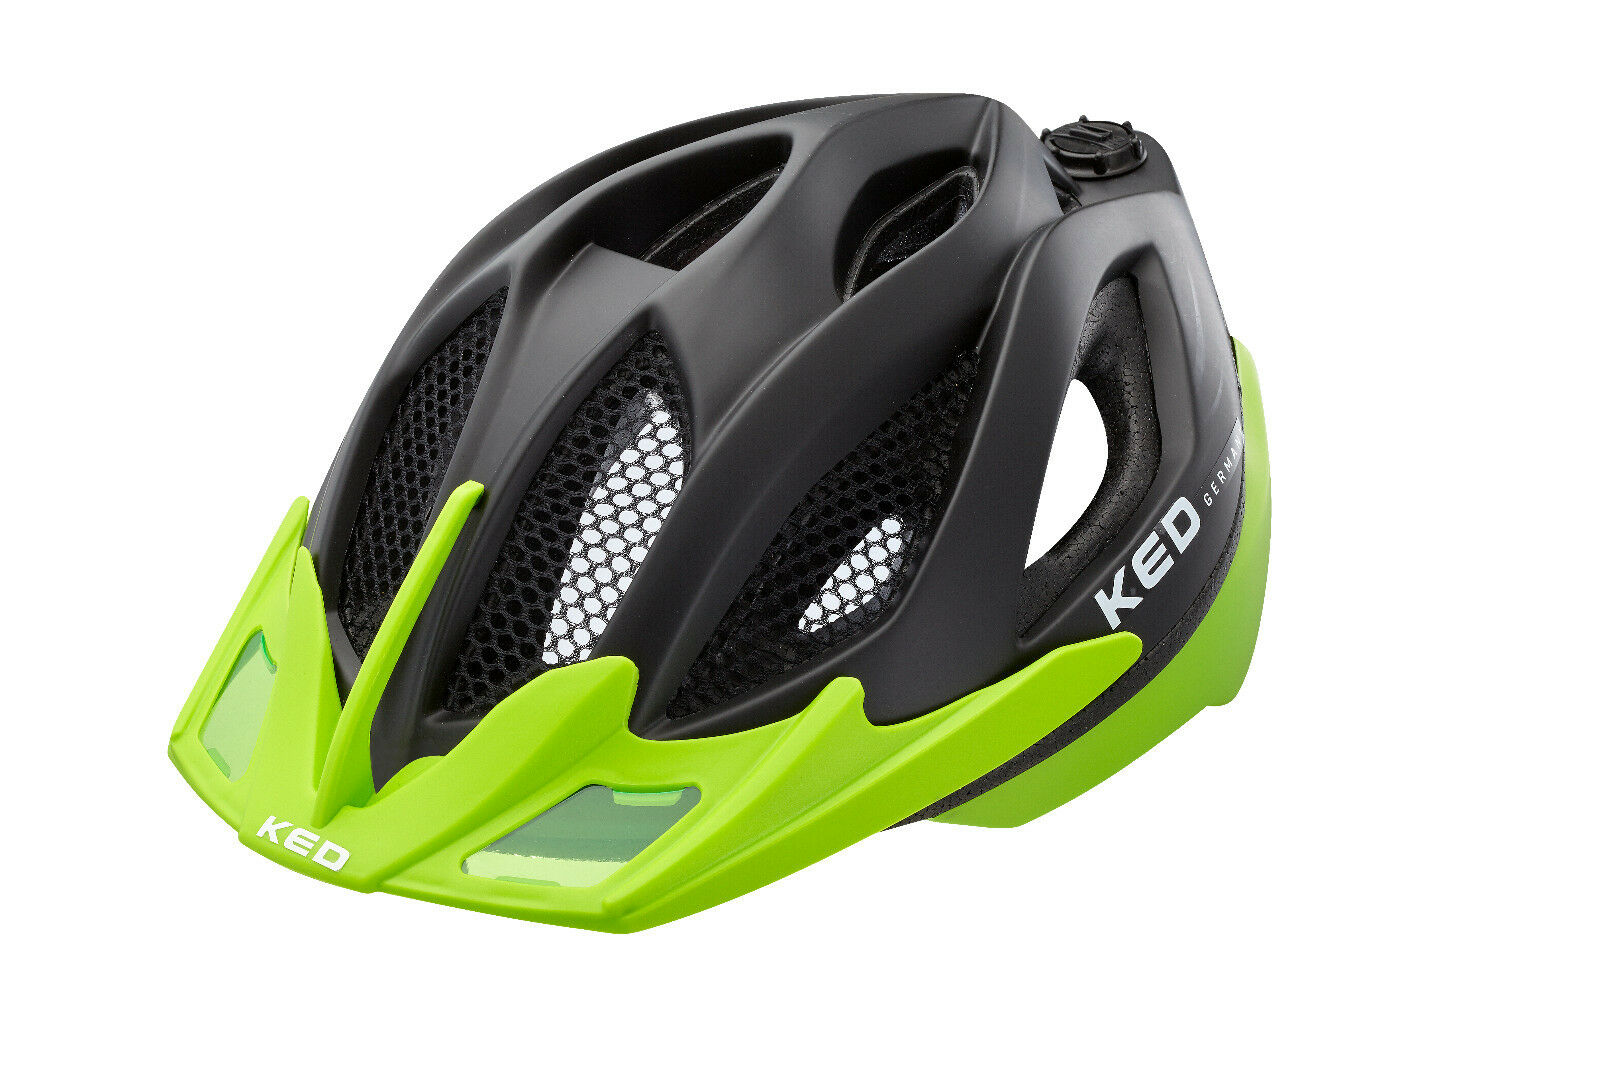 KED Fahrradhelm Spiri two Grün schwarz schwarz schwarz matt   Gr. M 52-58 cm   16302220 e53dd1